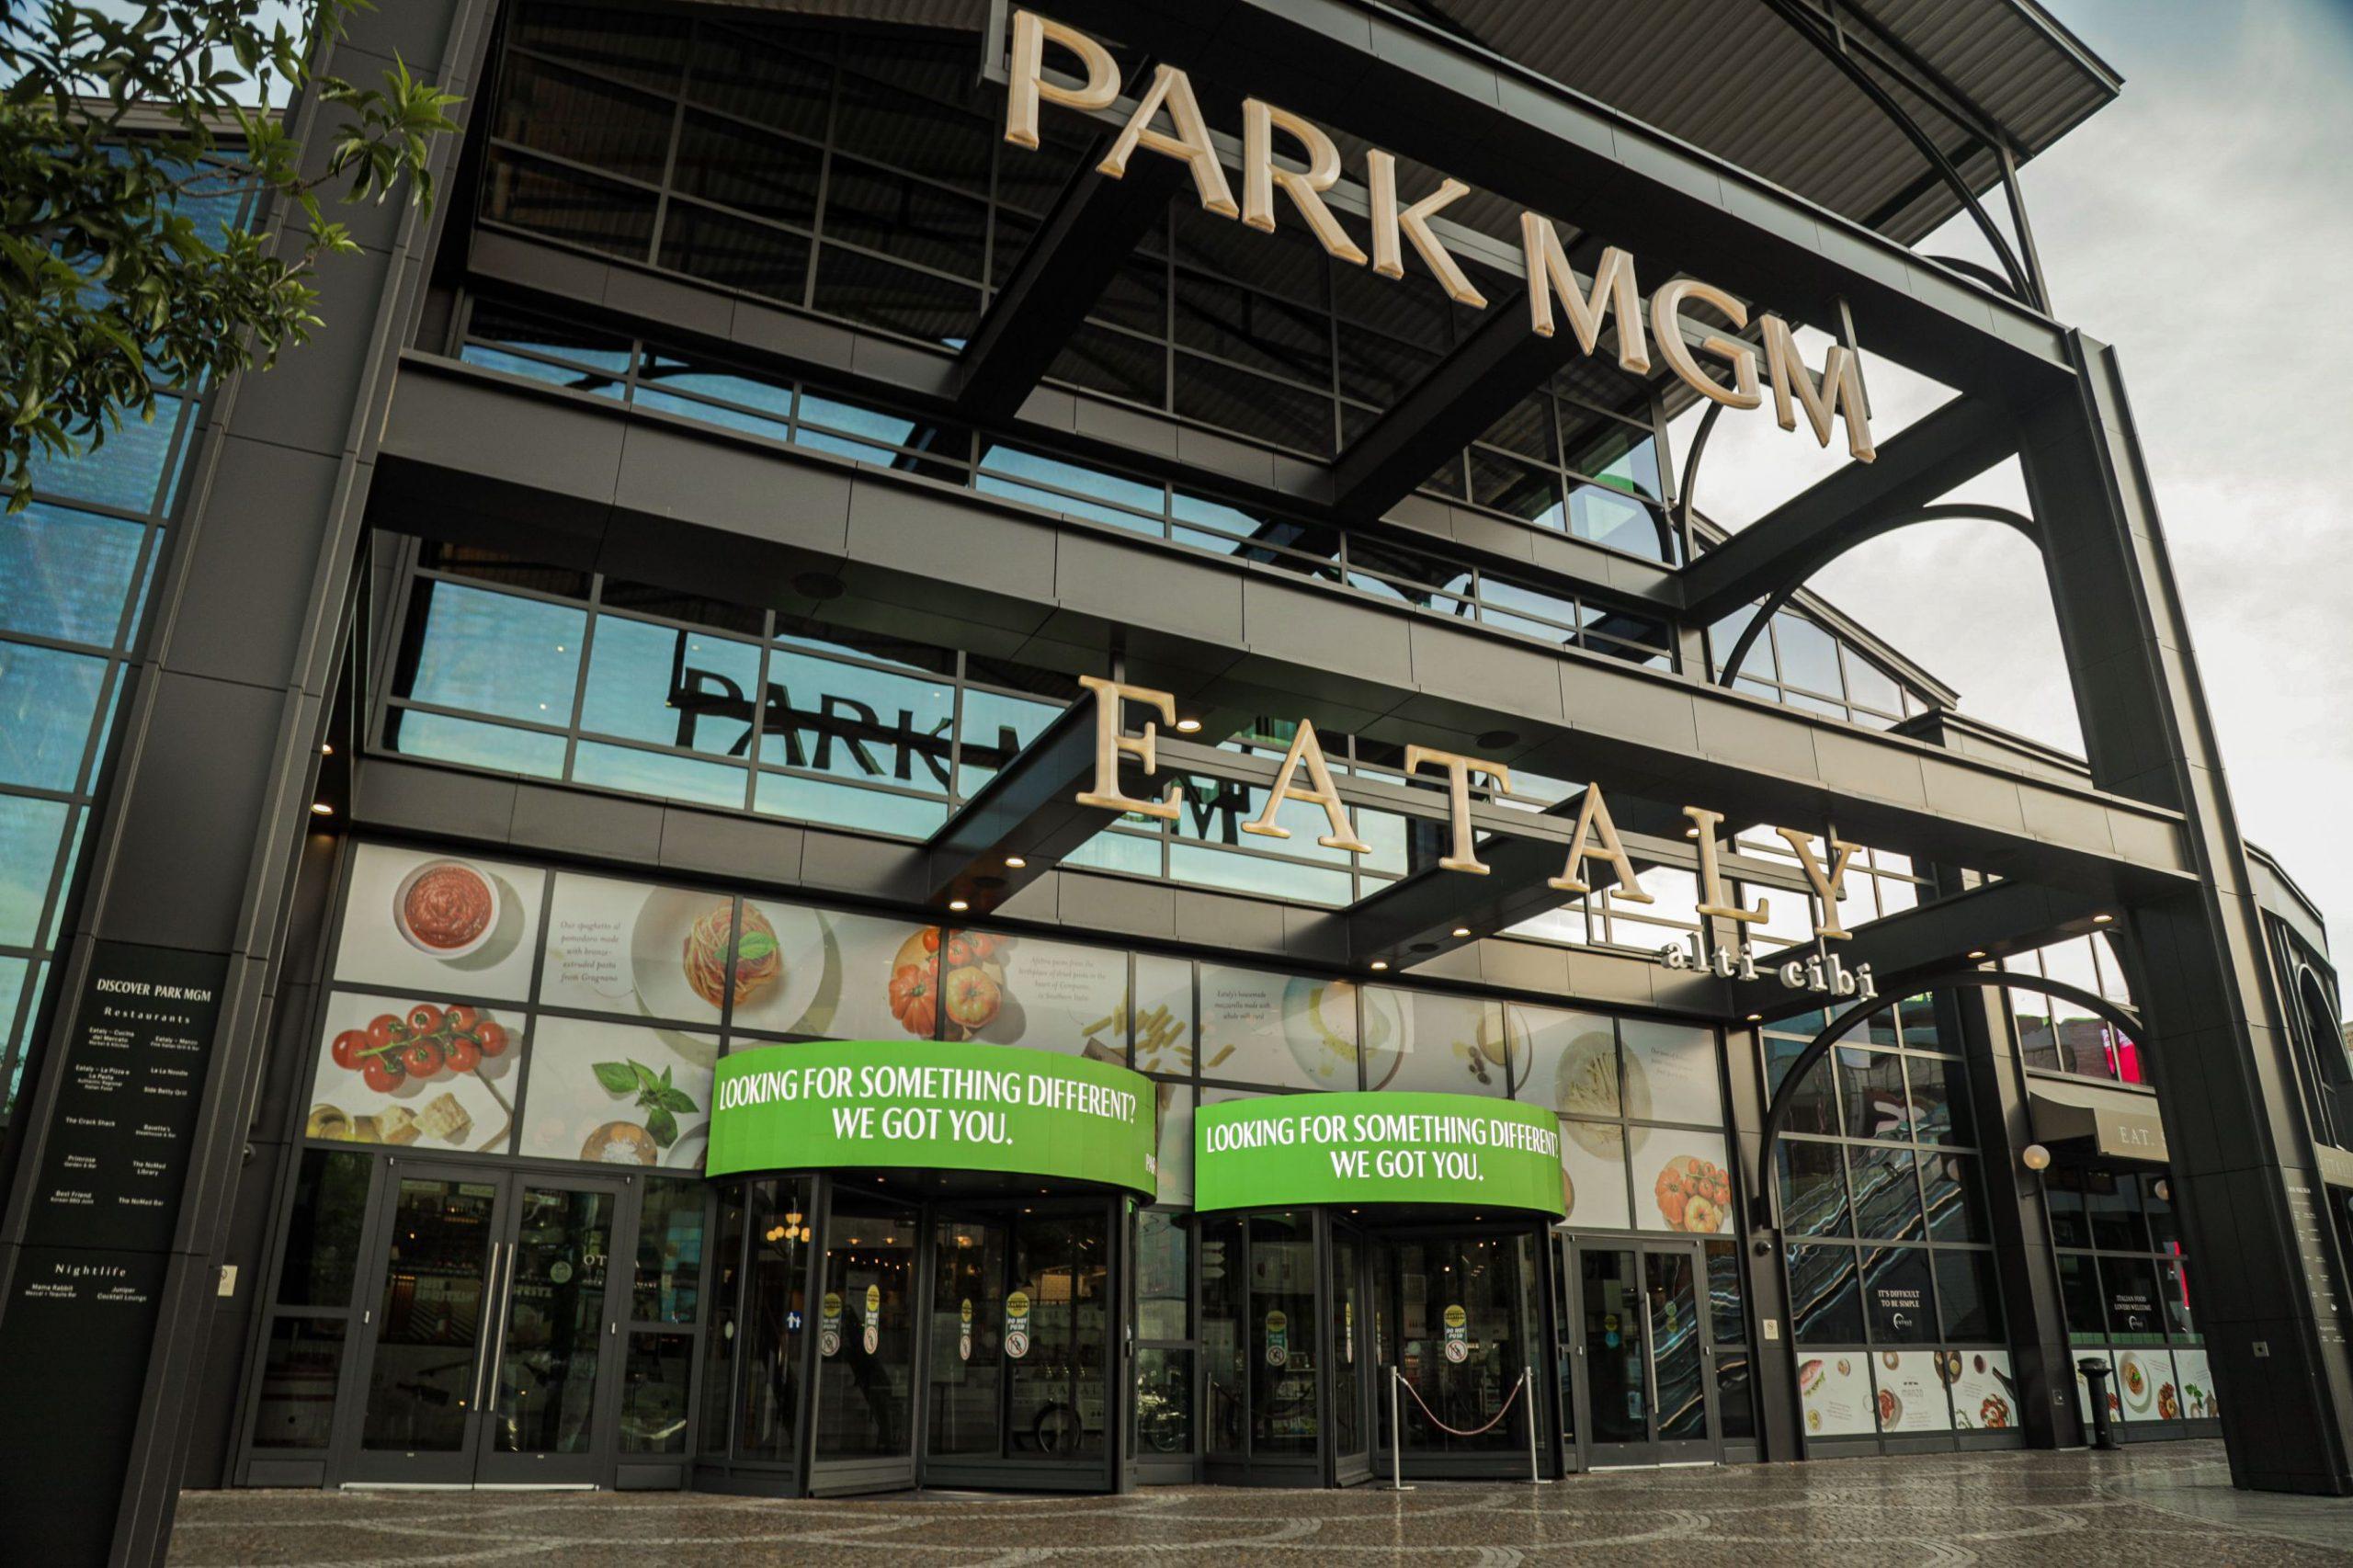 PARK MGM EATALY